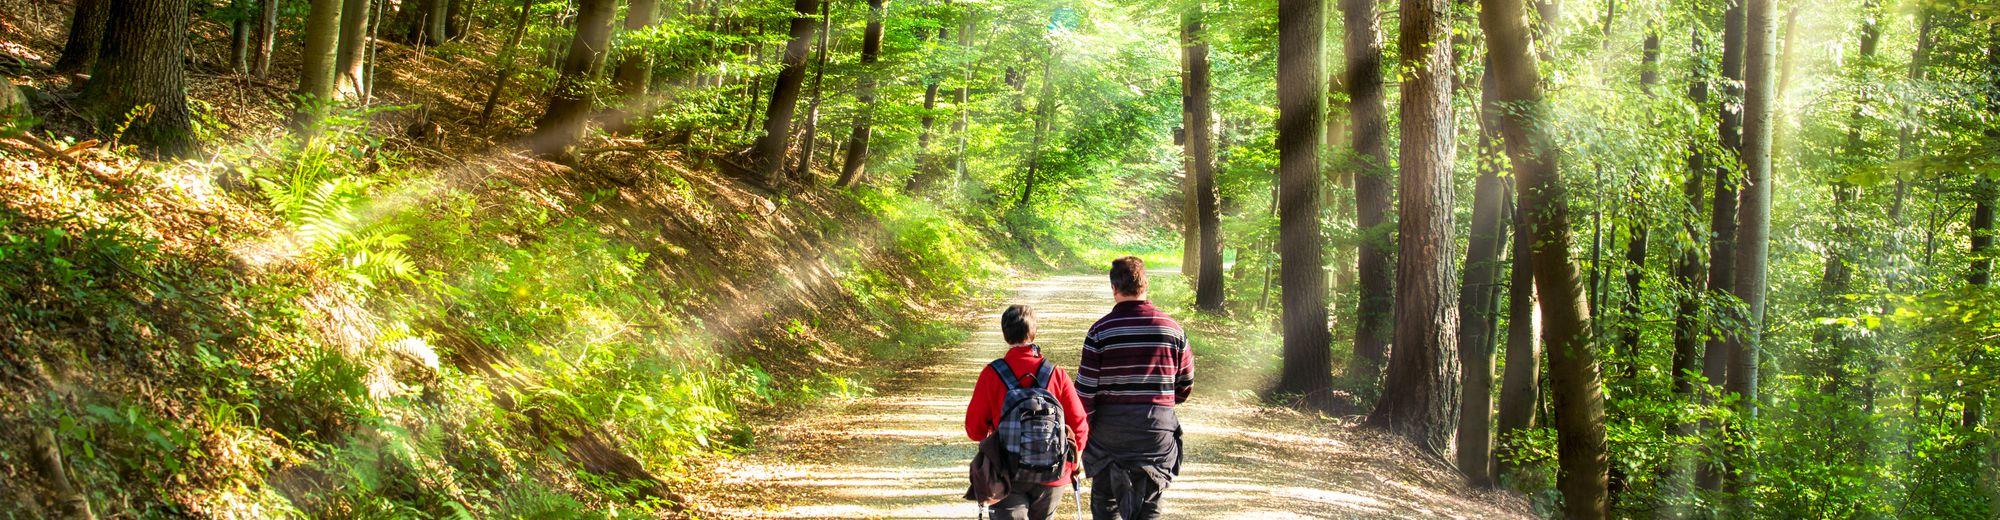 Spaziergang im Wald | © eyetronic - stock.adobe.com